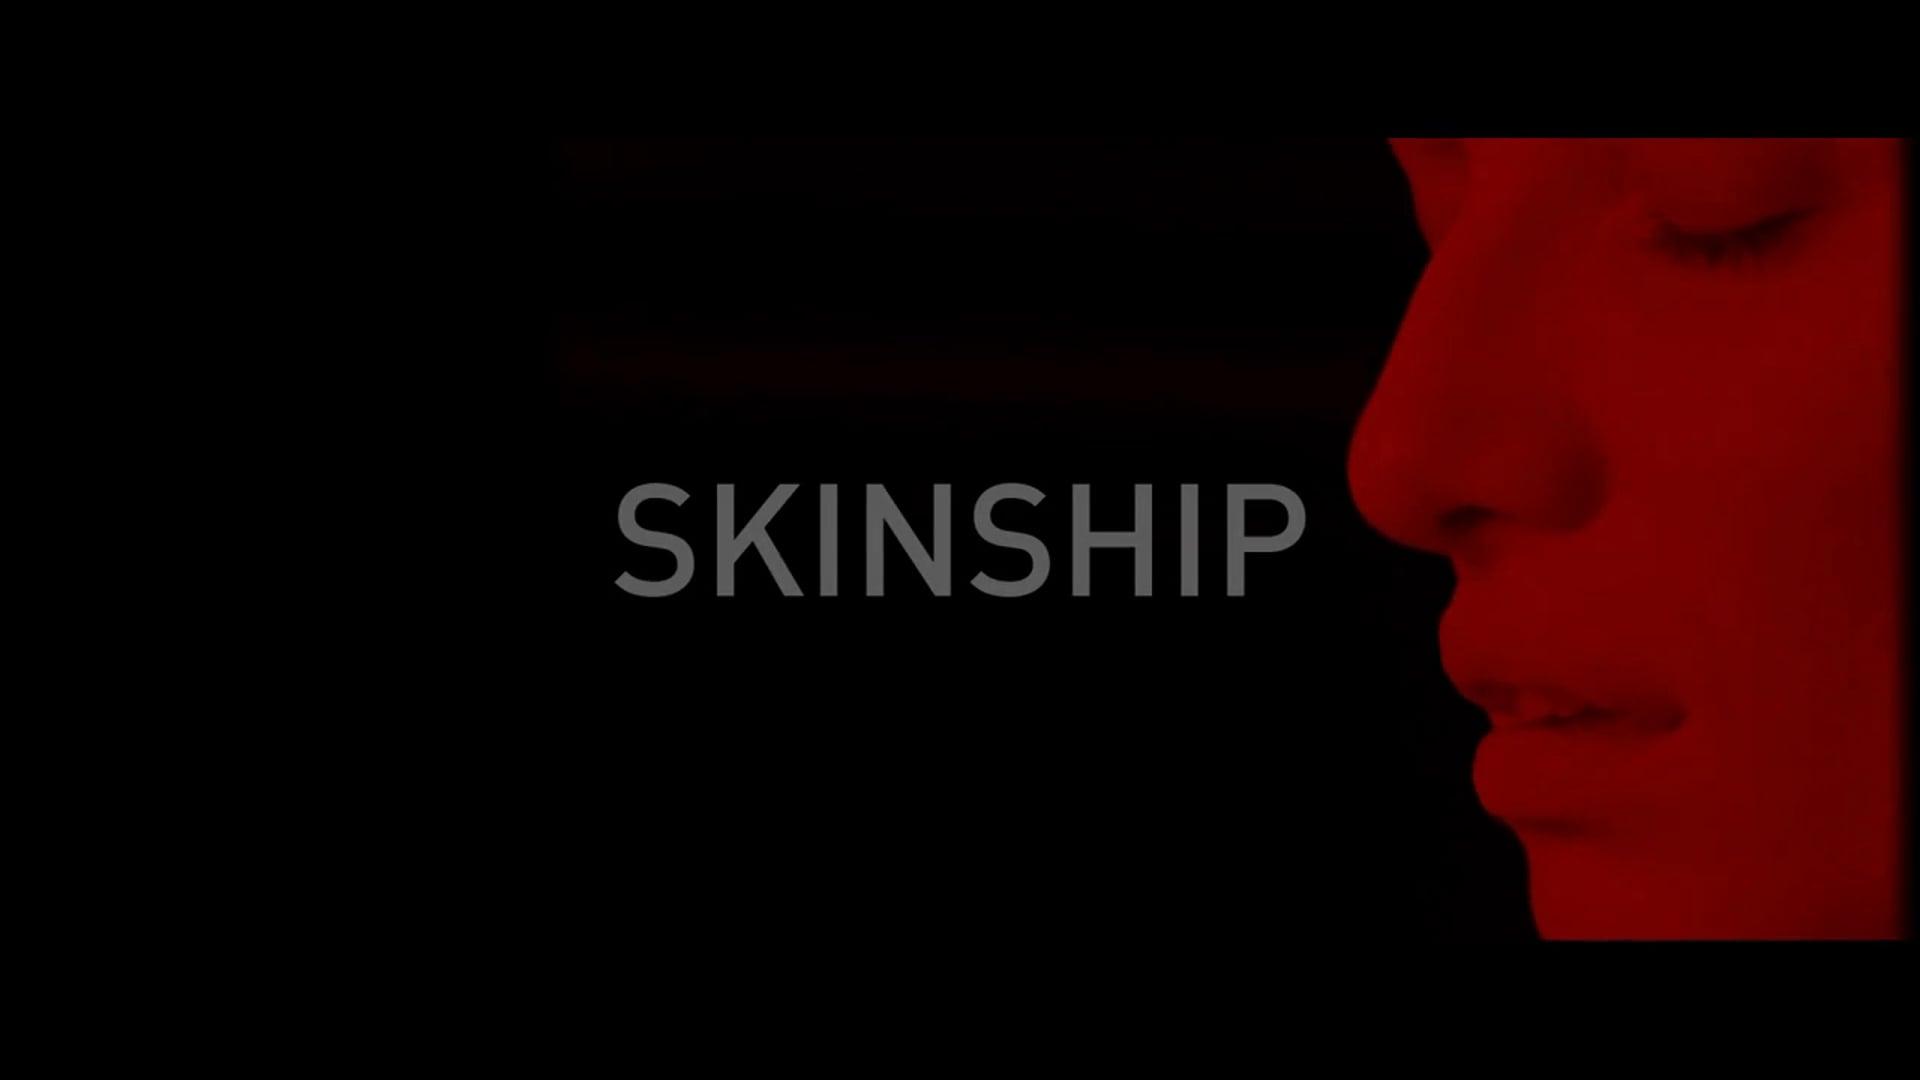 Skinship - Trailer